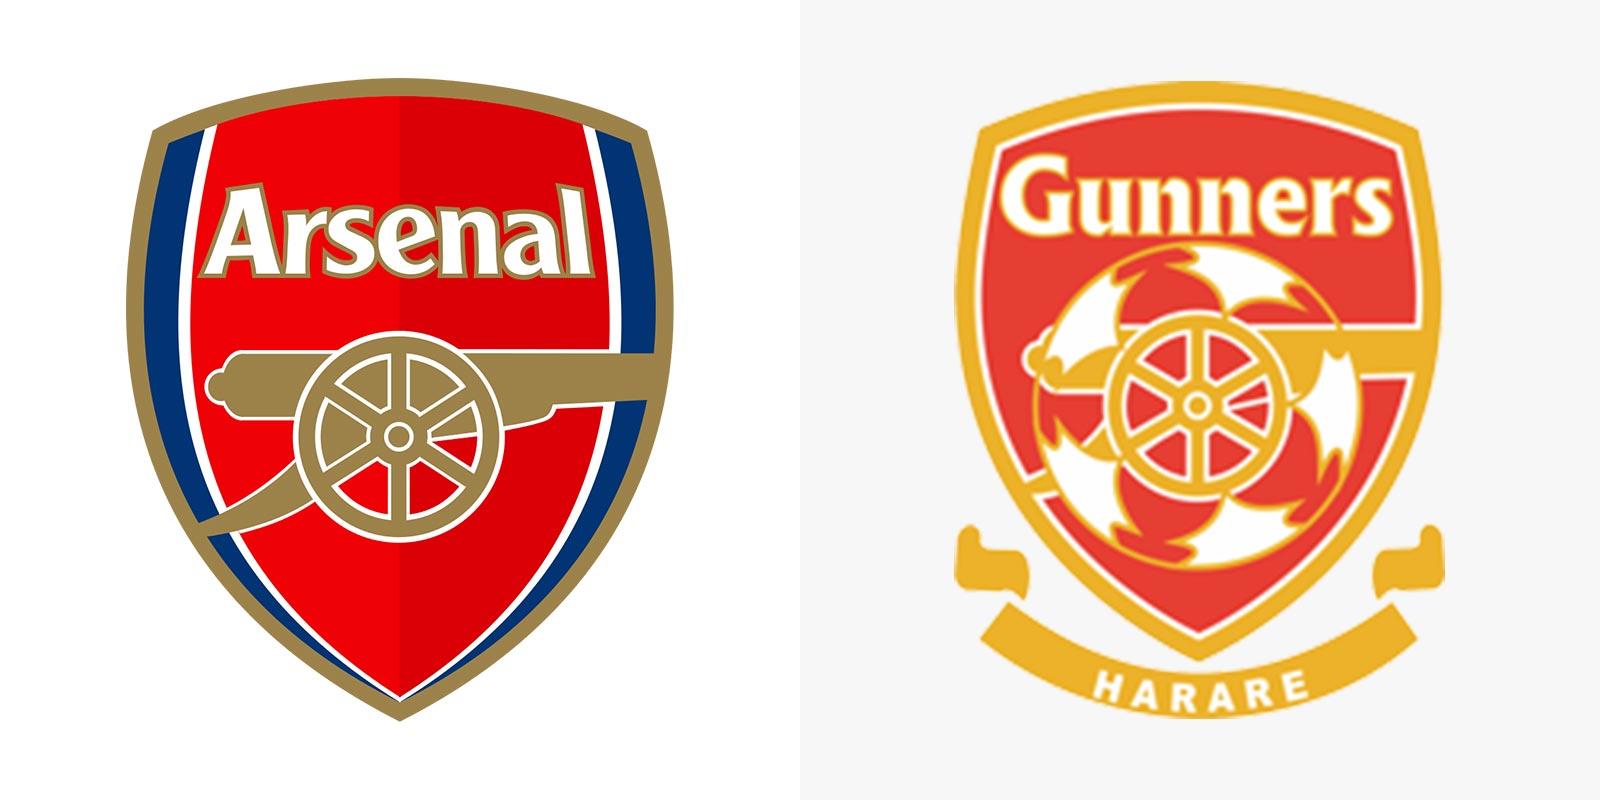 Arsenal - Gunners Harare